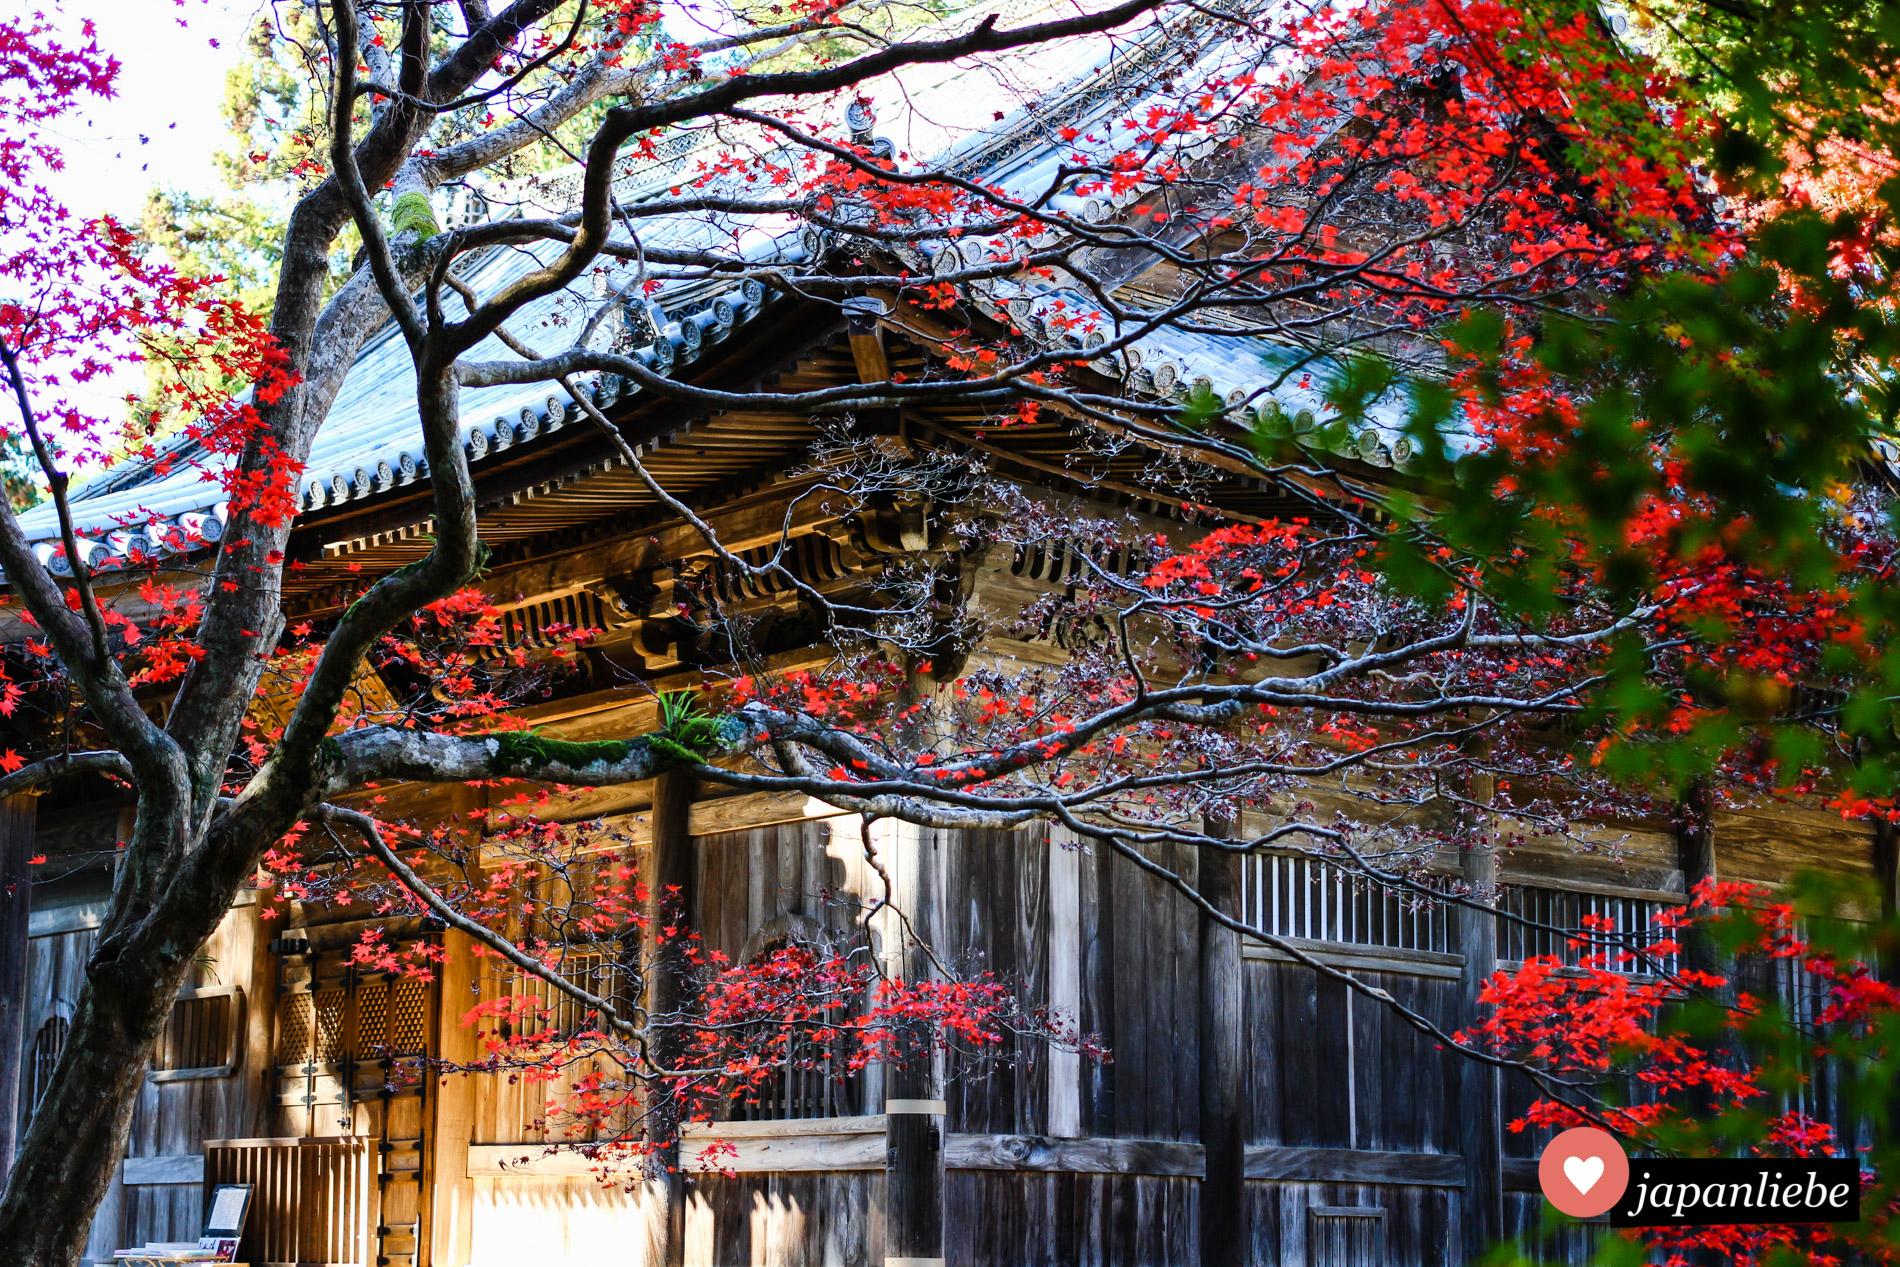 Leuchtend rotes Herbstlaub am Nyohō-ji-Tempel in Ōzu.